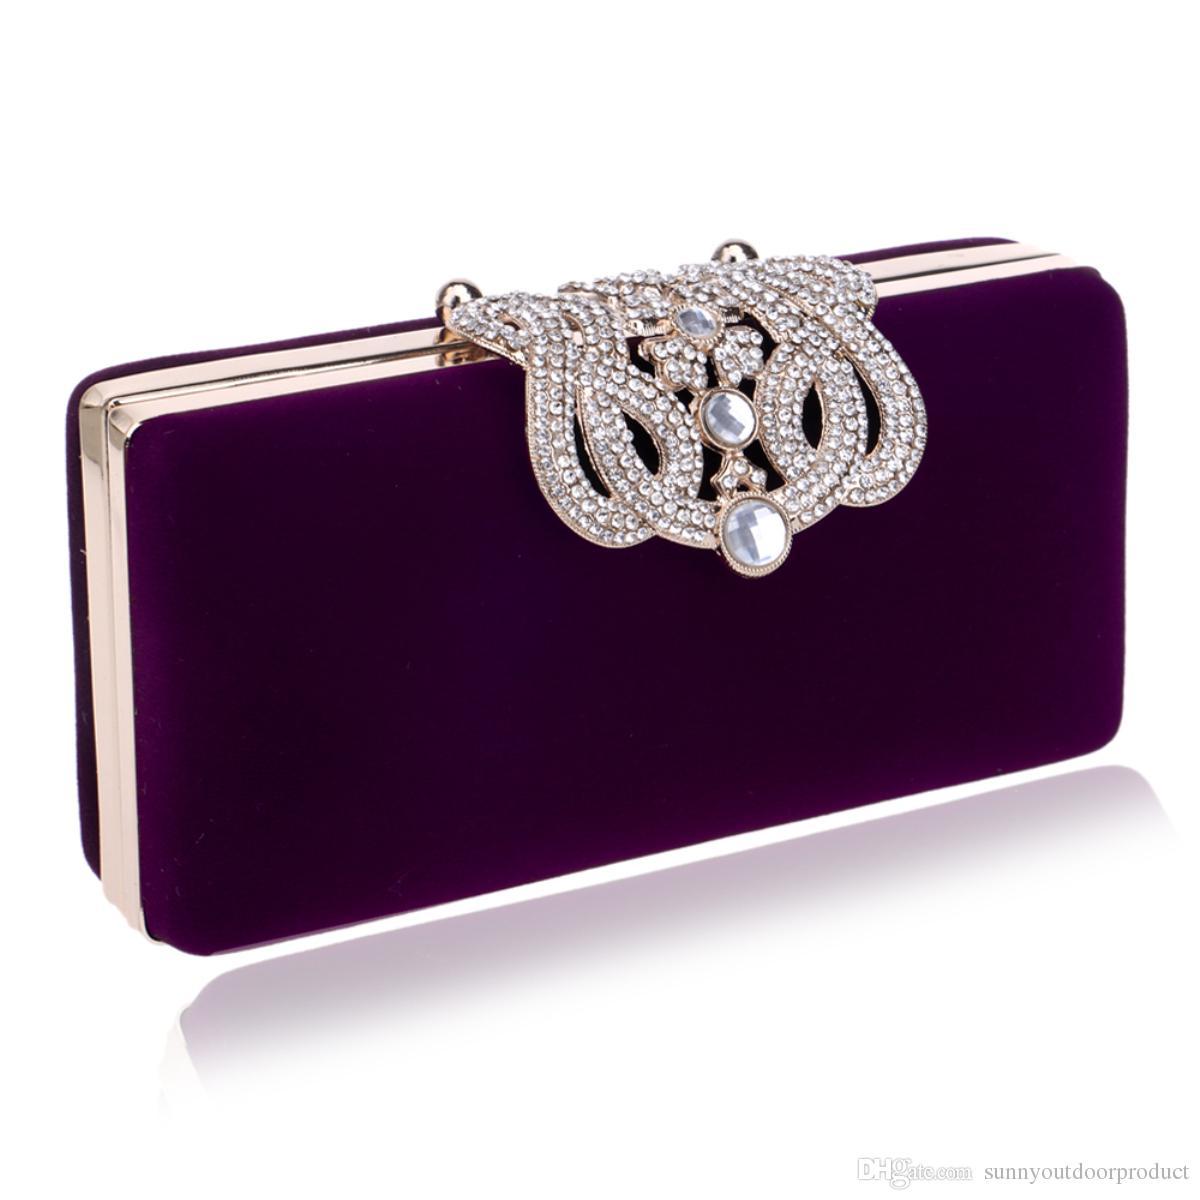 Women Fashion Clutch Evening bag Crown Rhinestone Exquisite lint Shoulder Bag Diamond Lady Portable Phone Handbag Wallet Purse For Wedding